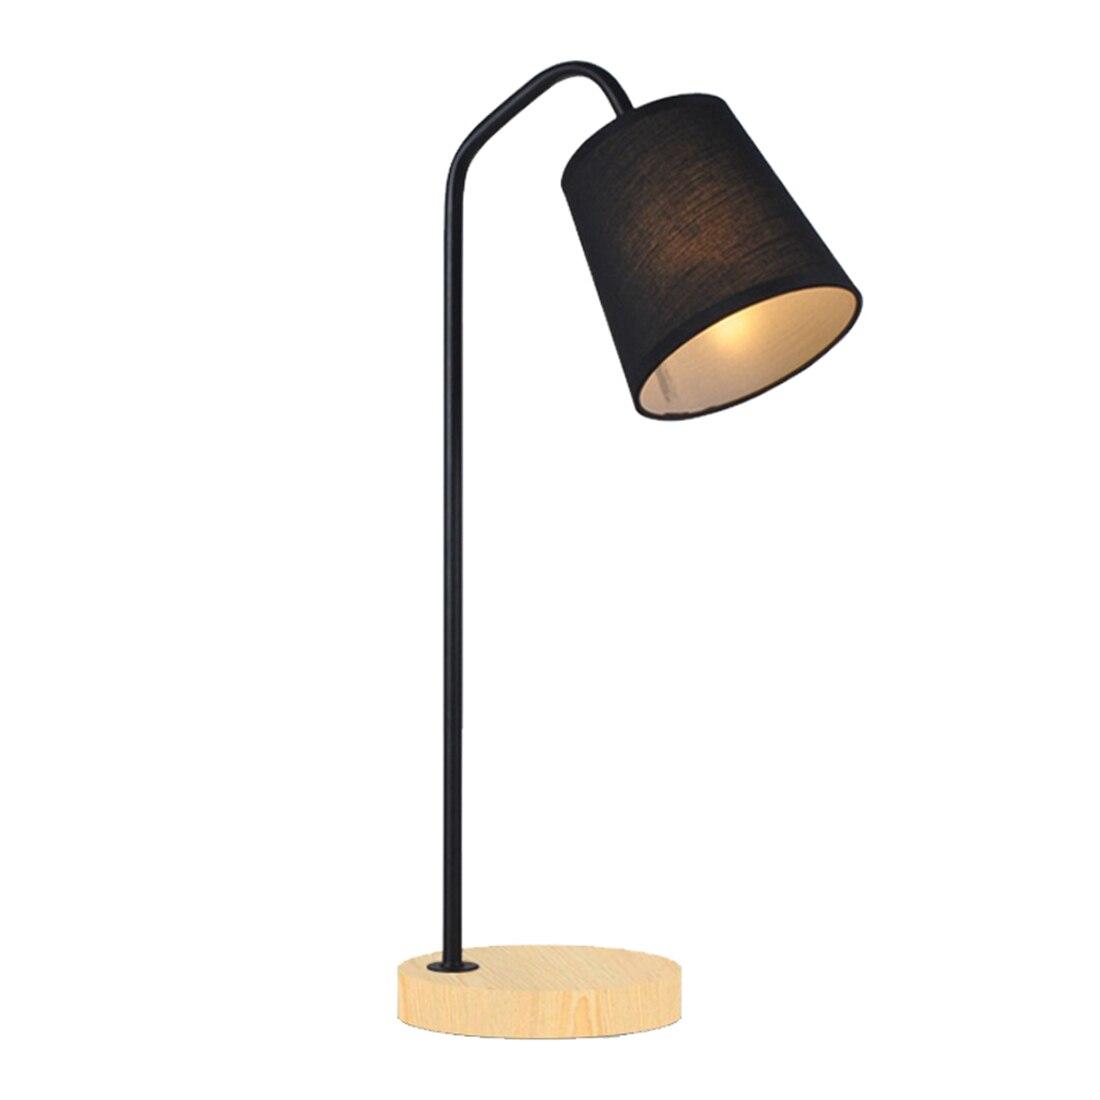 Attic Retro Table Lamp Traditional American Country Wooden Desk Lamp Scandinavian Metal Desktop Lighting Simple Modern Ey